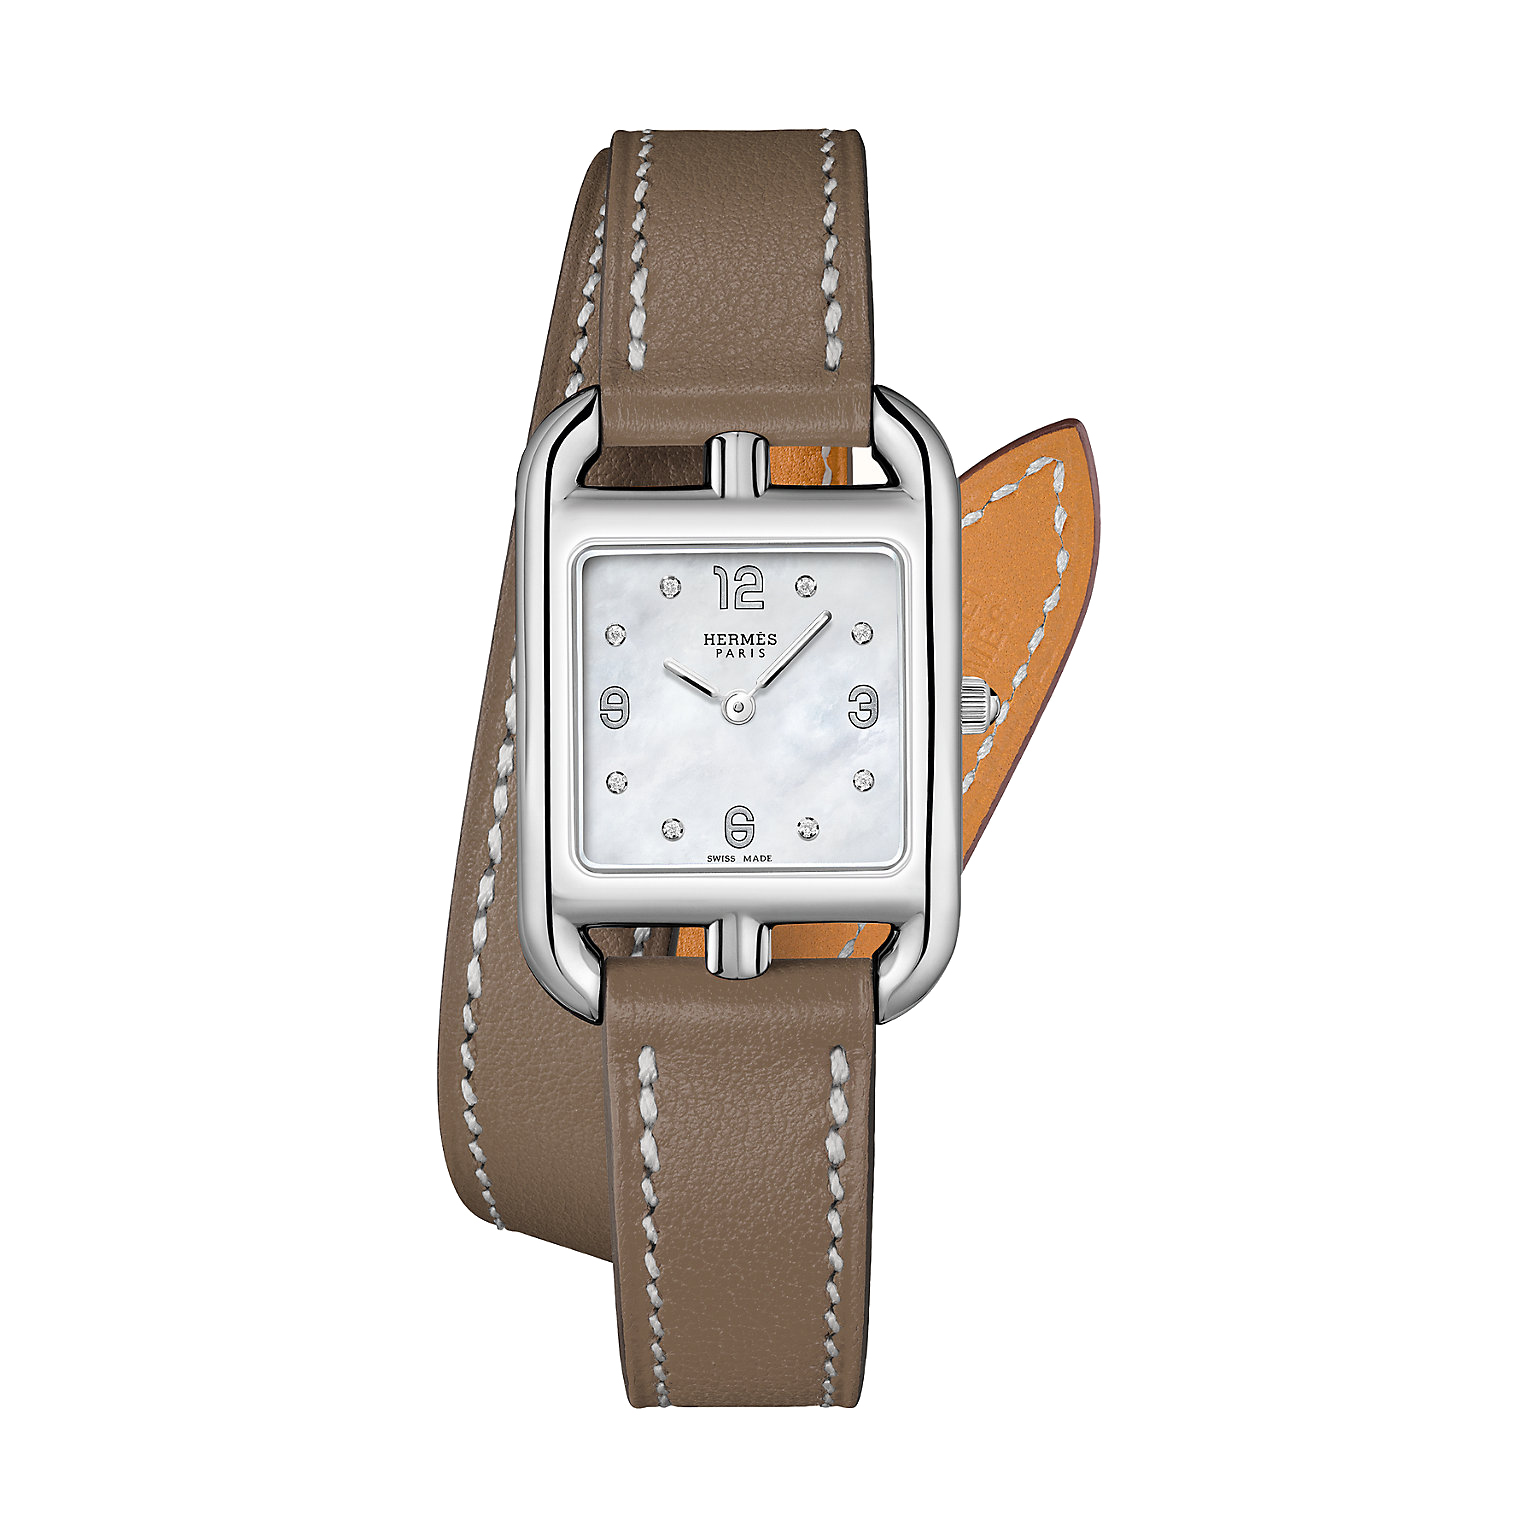 Hermès-cape-cod-23-x-23mm-Hall-of-Time-044314WW00